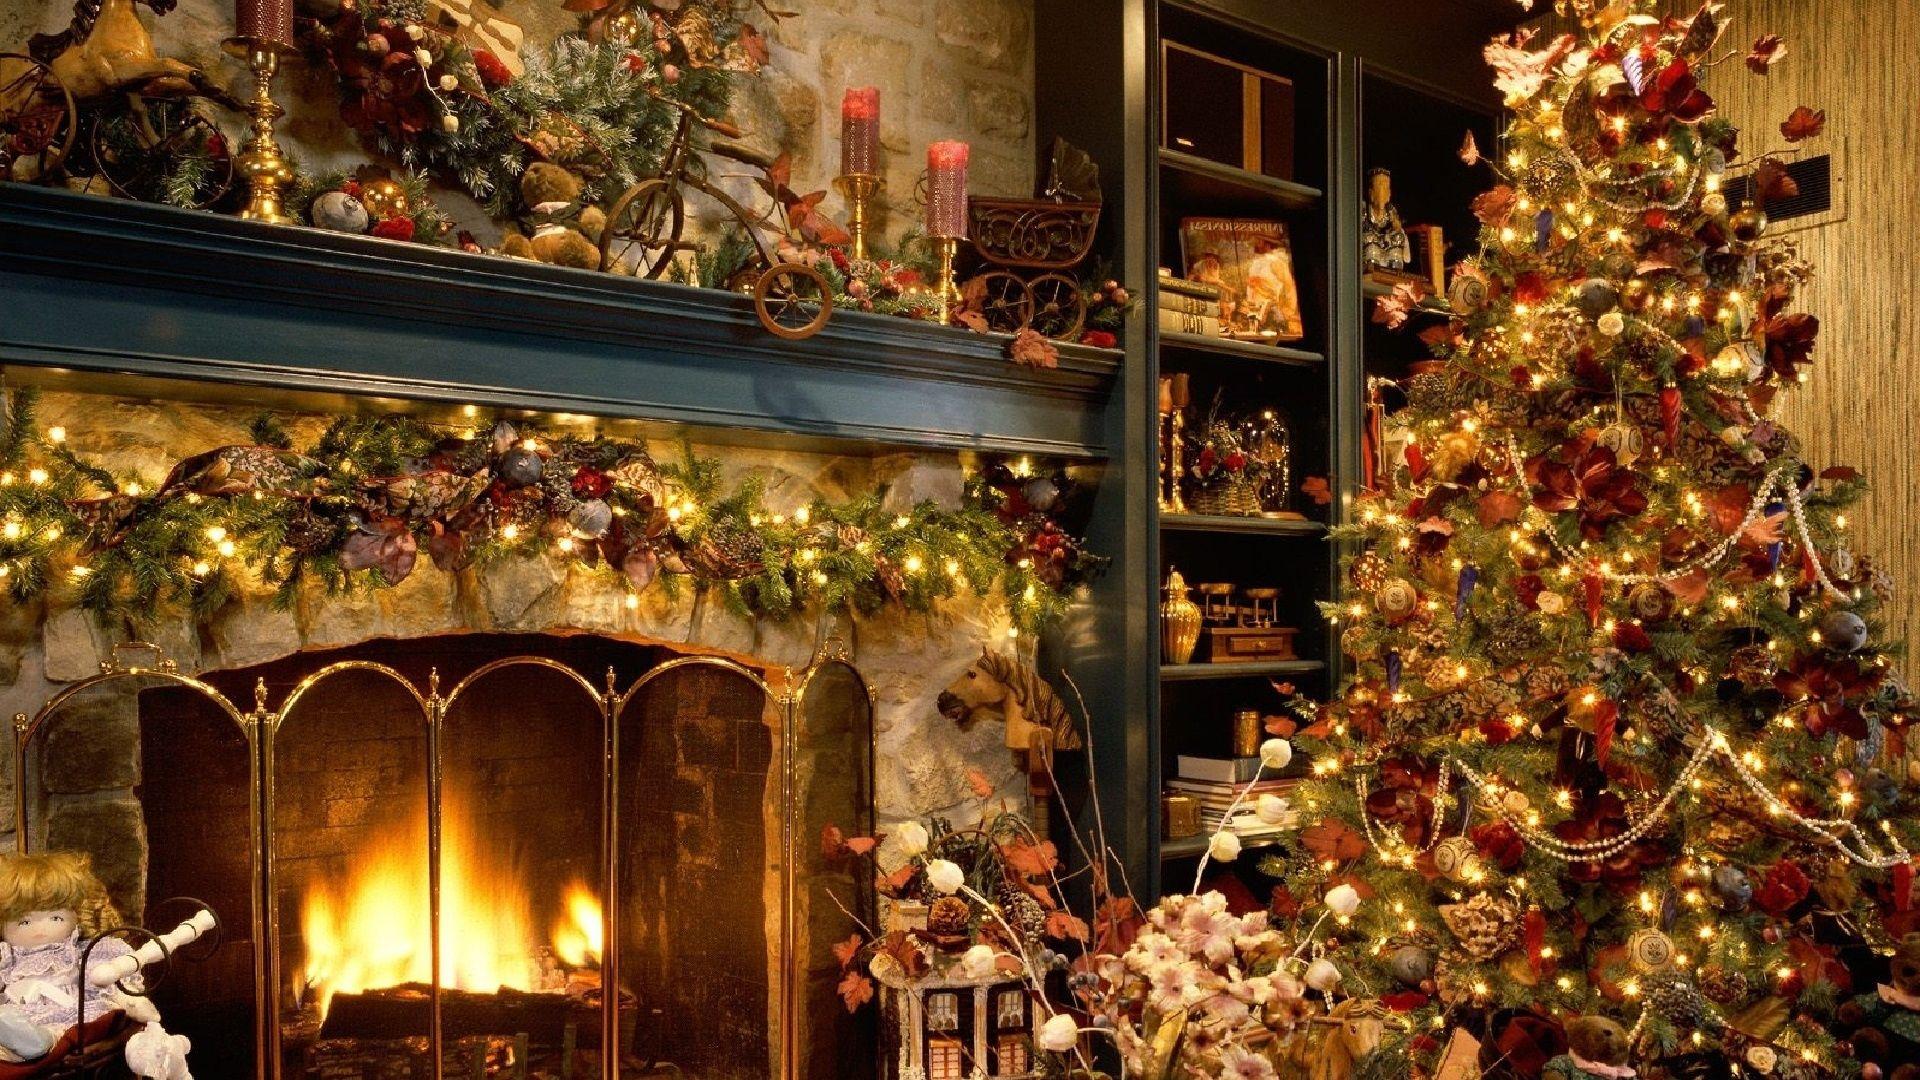 Christmas Fireplace Comfort Wallpaper